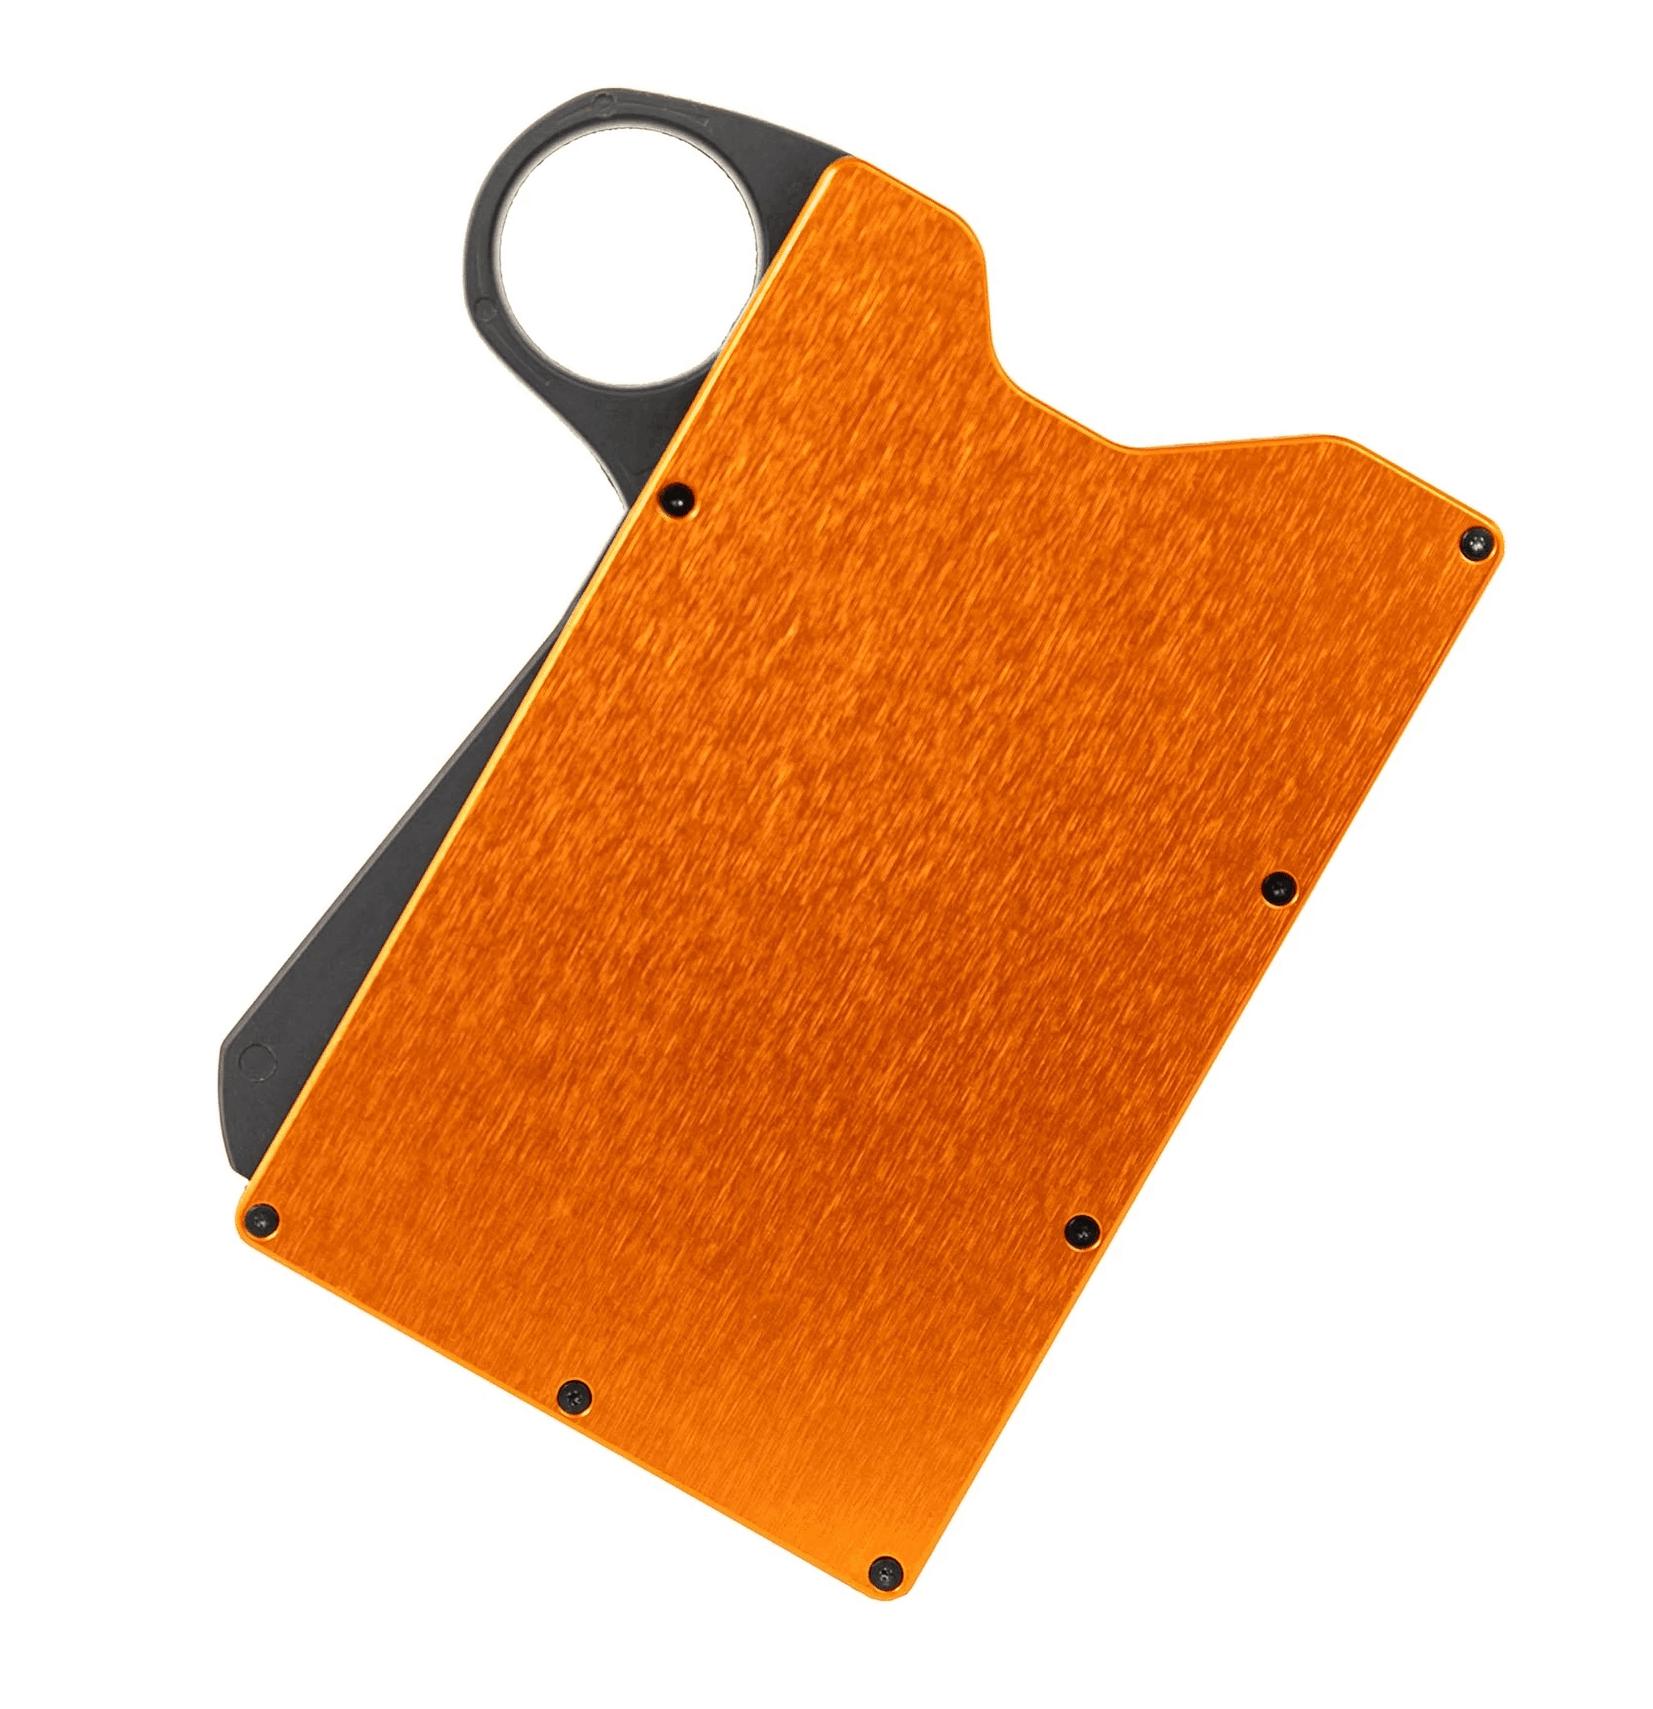 Grip6 Wallet